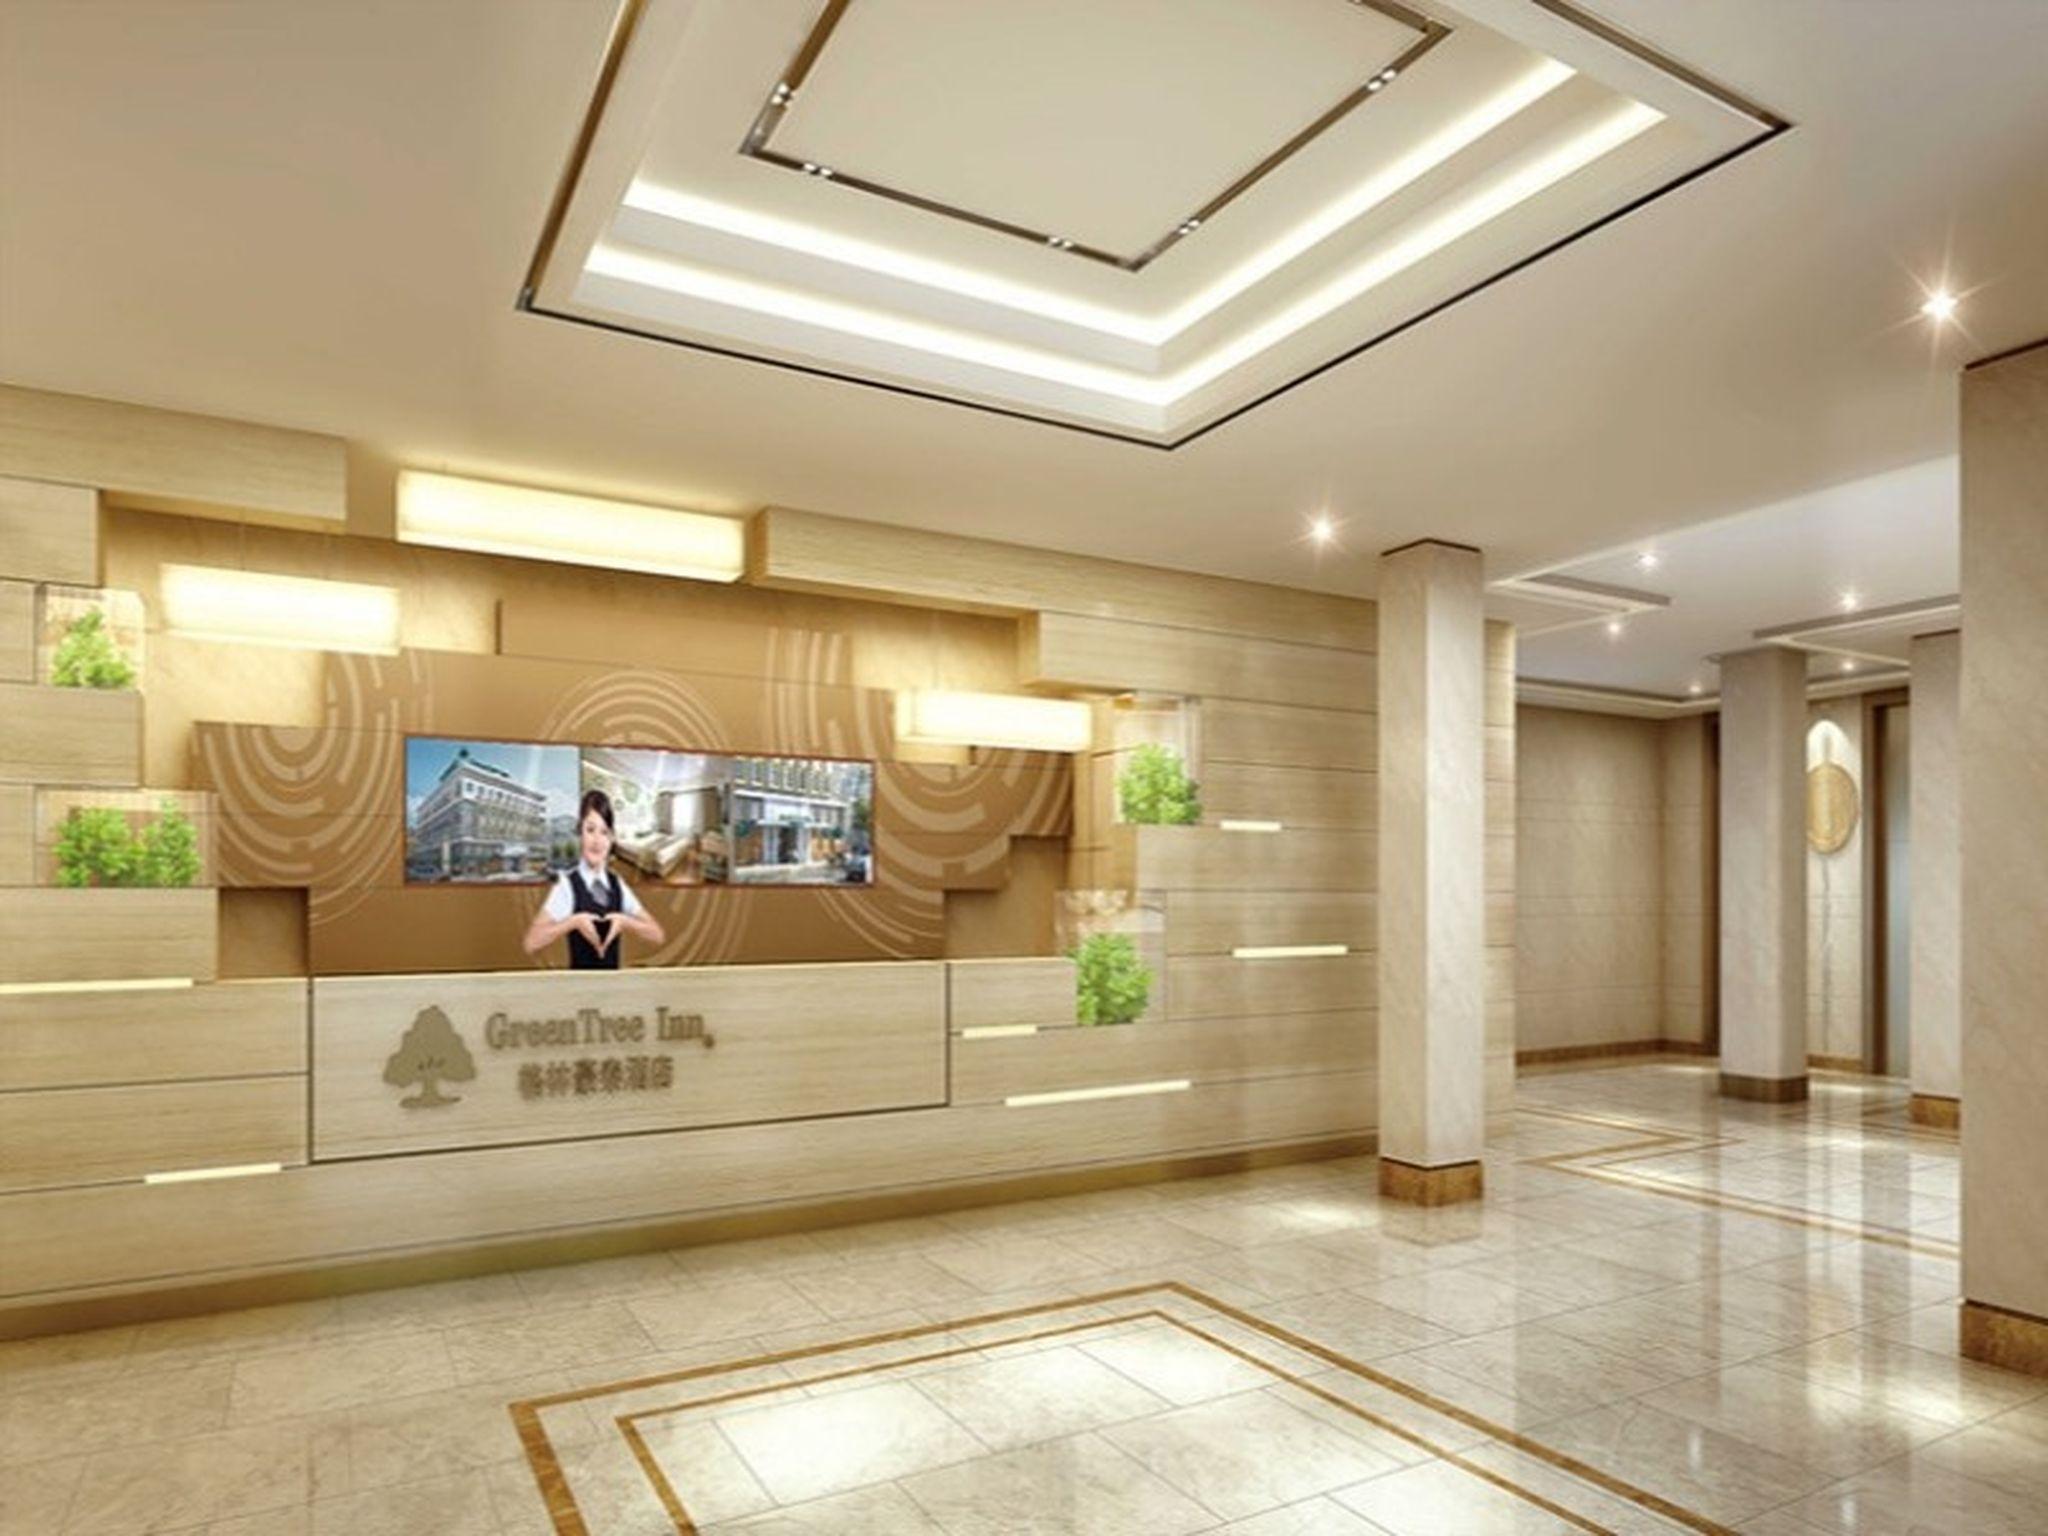 GreenTree Inn Shaoxing Lihai Dongsen Commercial Square Branch